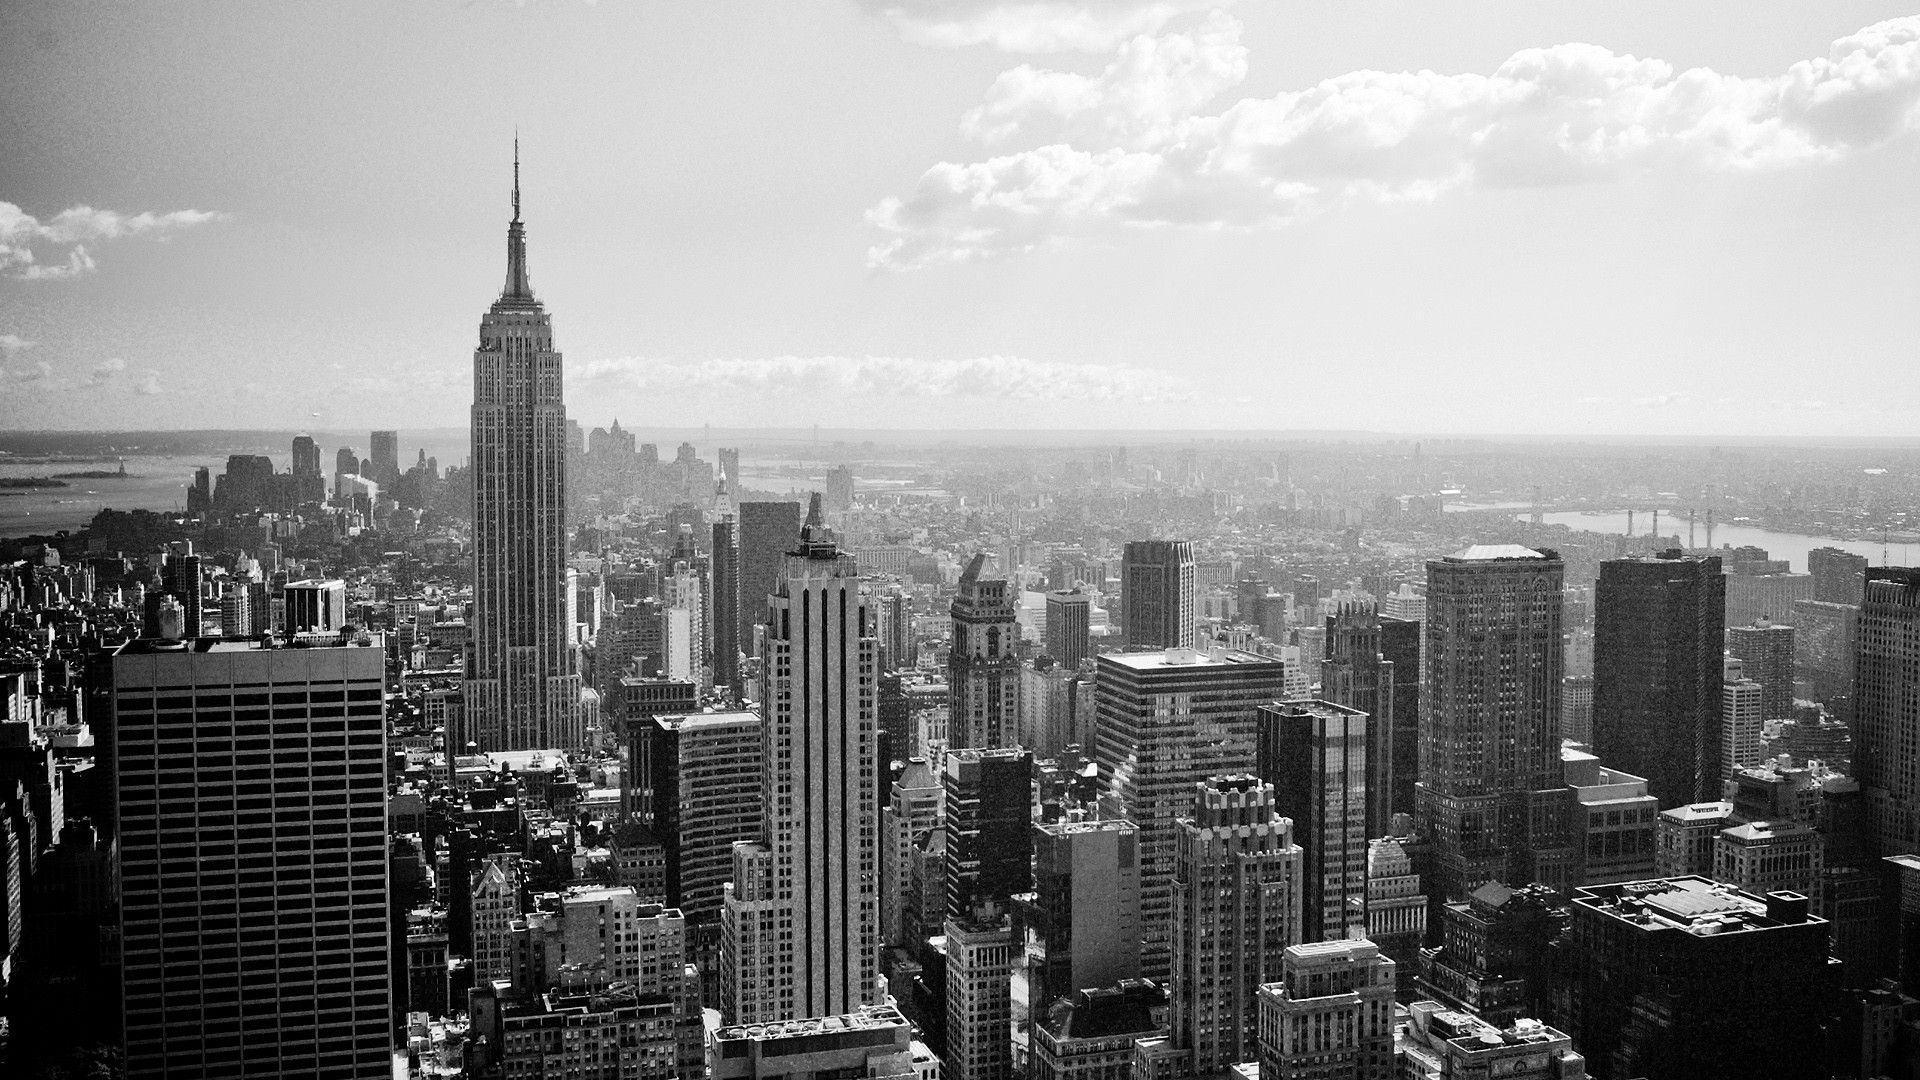 New York City Wallpaper Hd 425 Wallpaper Risewall Com New York Wallpaper City Wallpaper New York Hotels